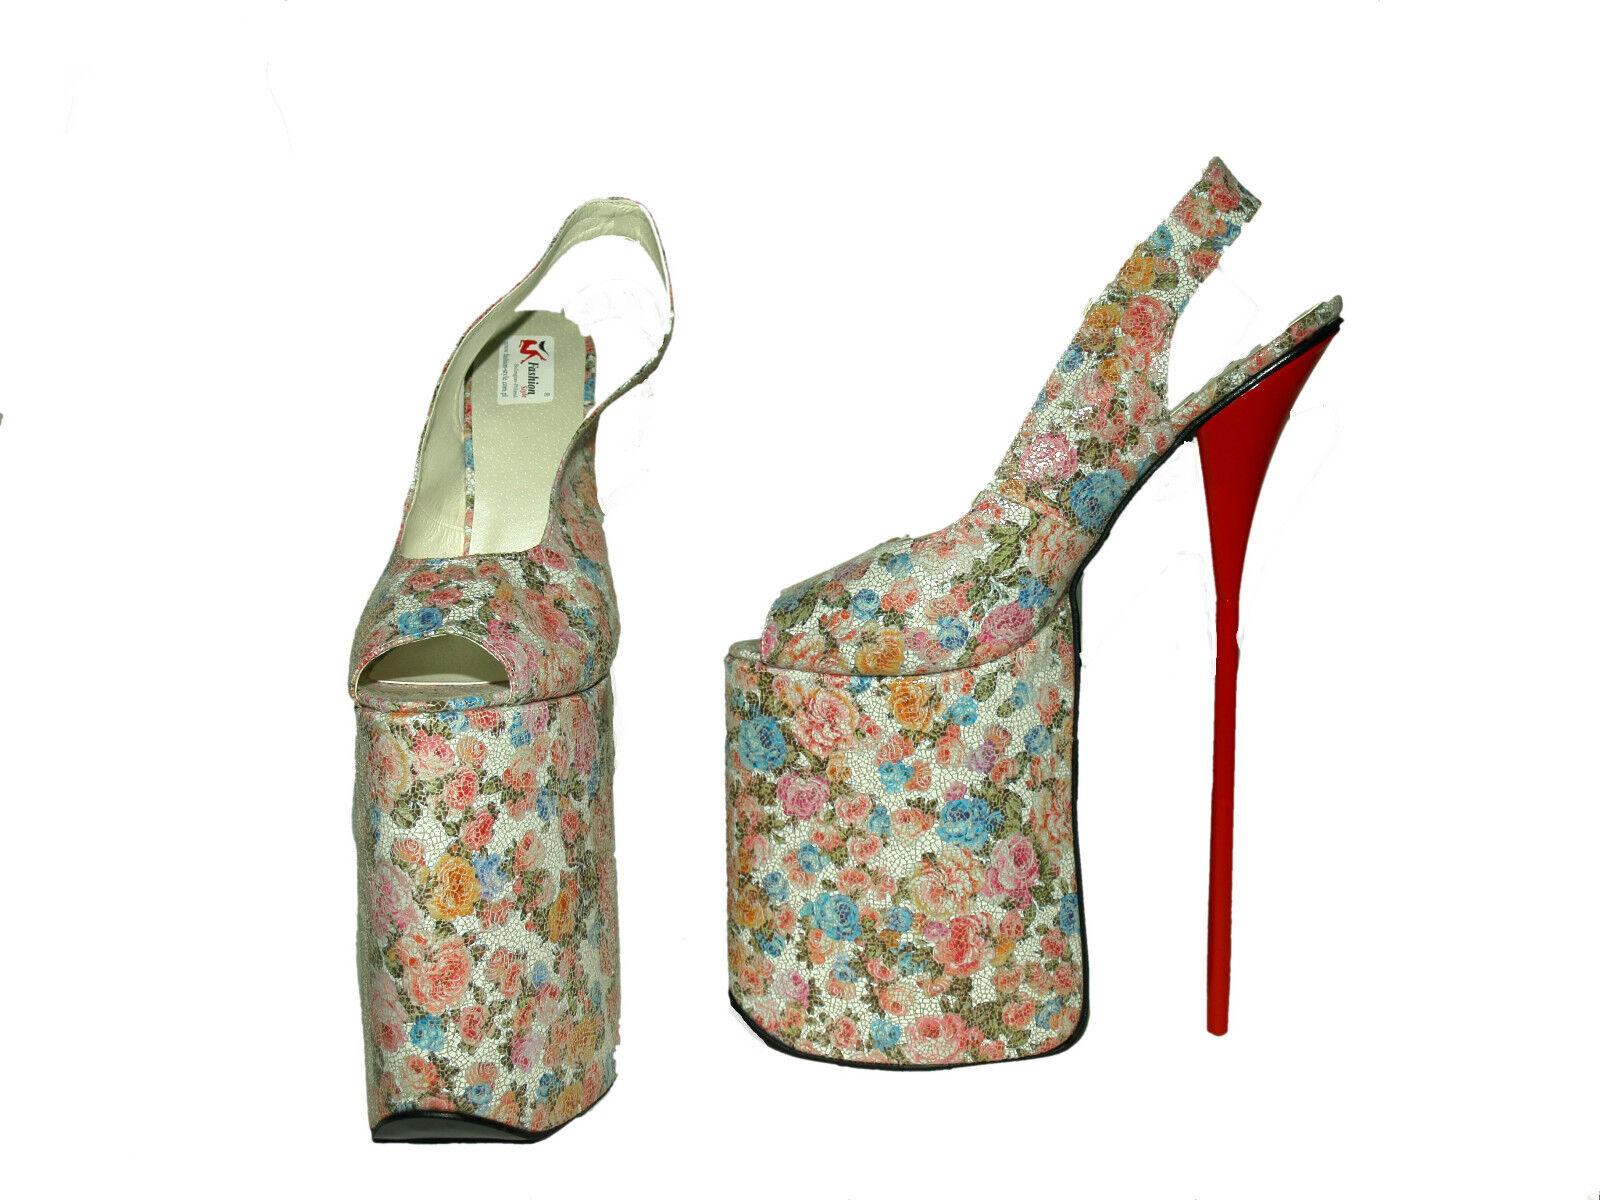 30CM HIGHS Stiefel Stiefel Stiefel FLOWERS EXCLUSIVE Größe 4-12 PLATFORM 20CM -POLAND FS 1518 f249b0